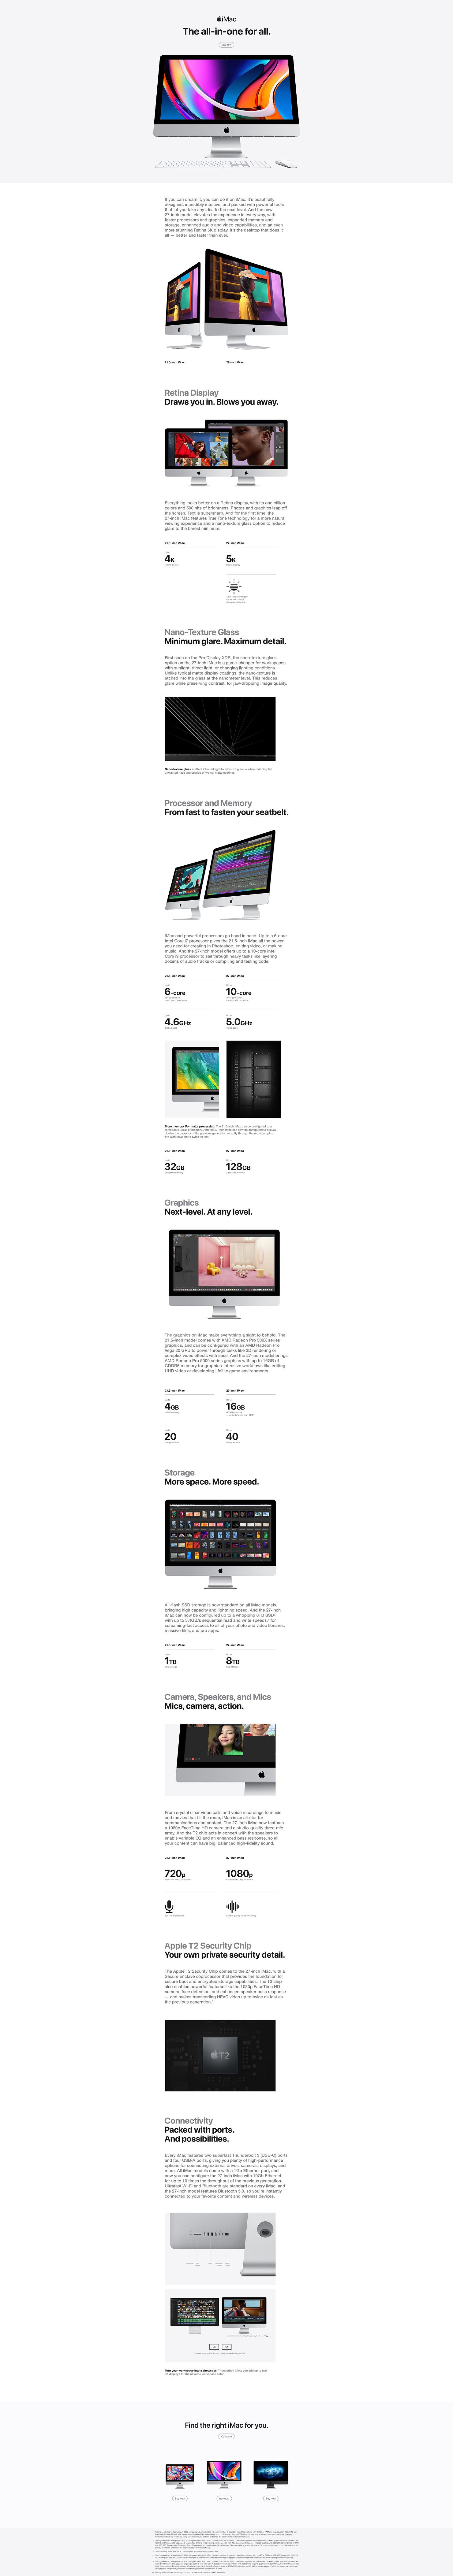 MEEN-iMac_MarketingPage_L_v1.jpg